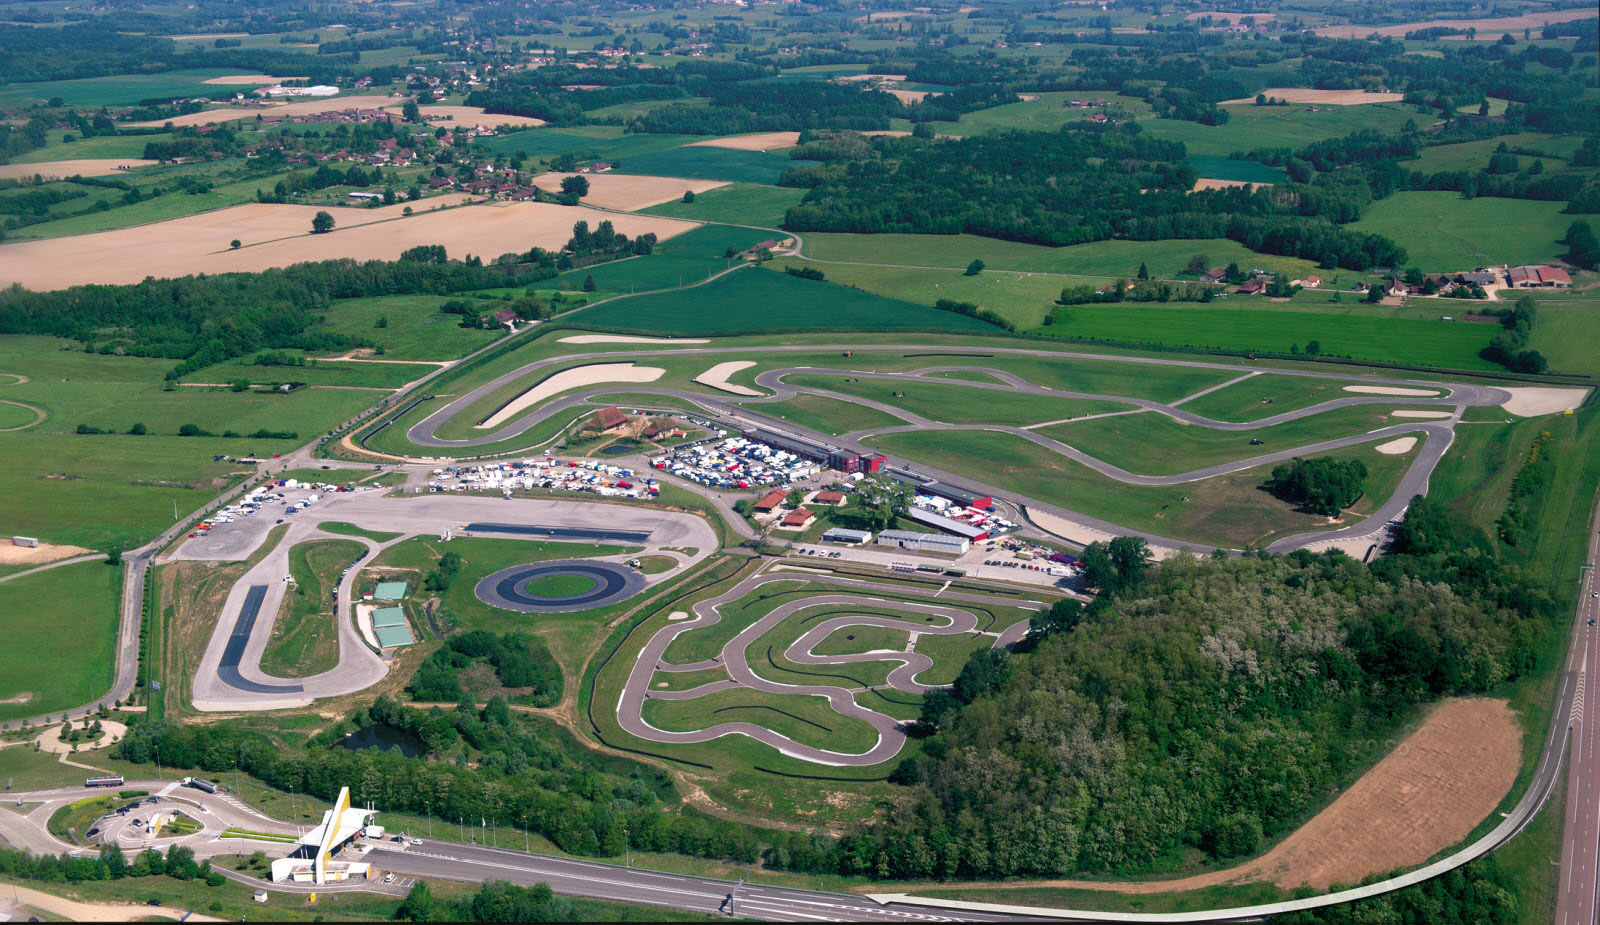 Circuit Bresse